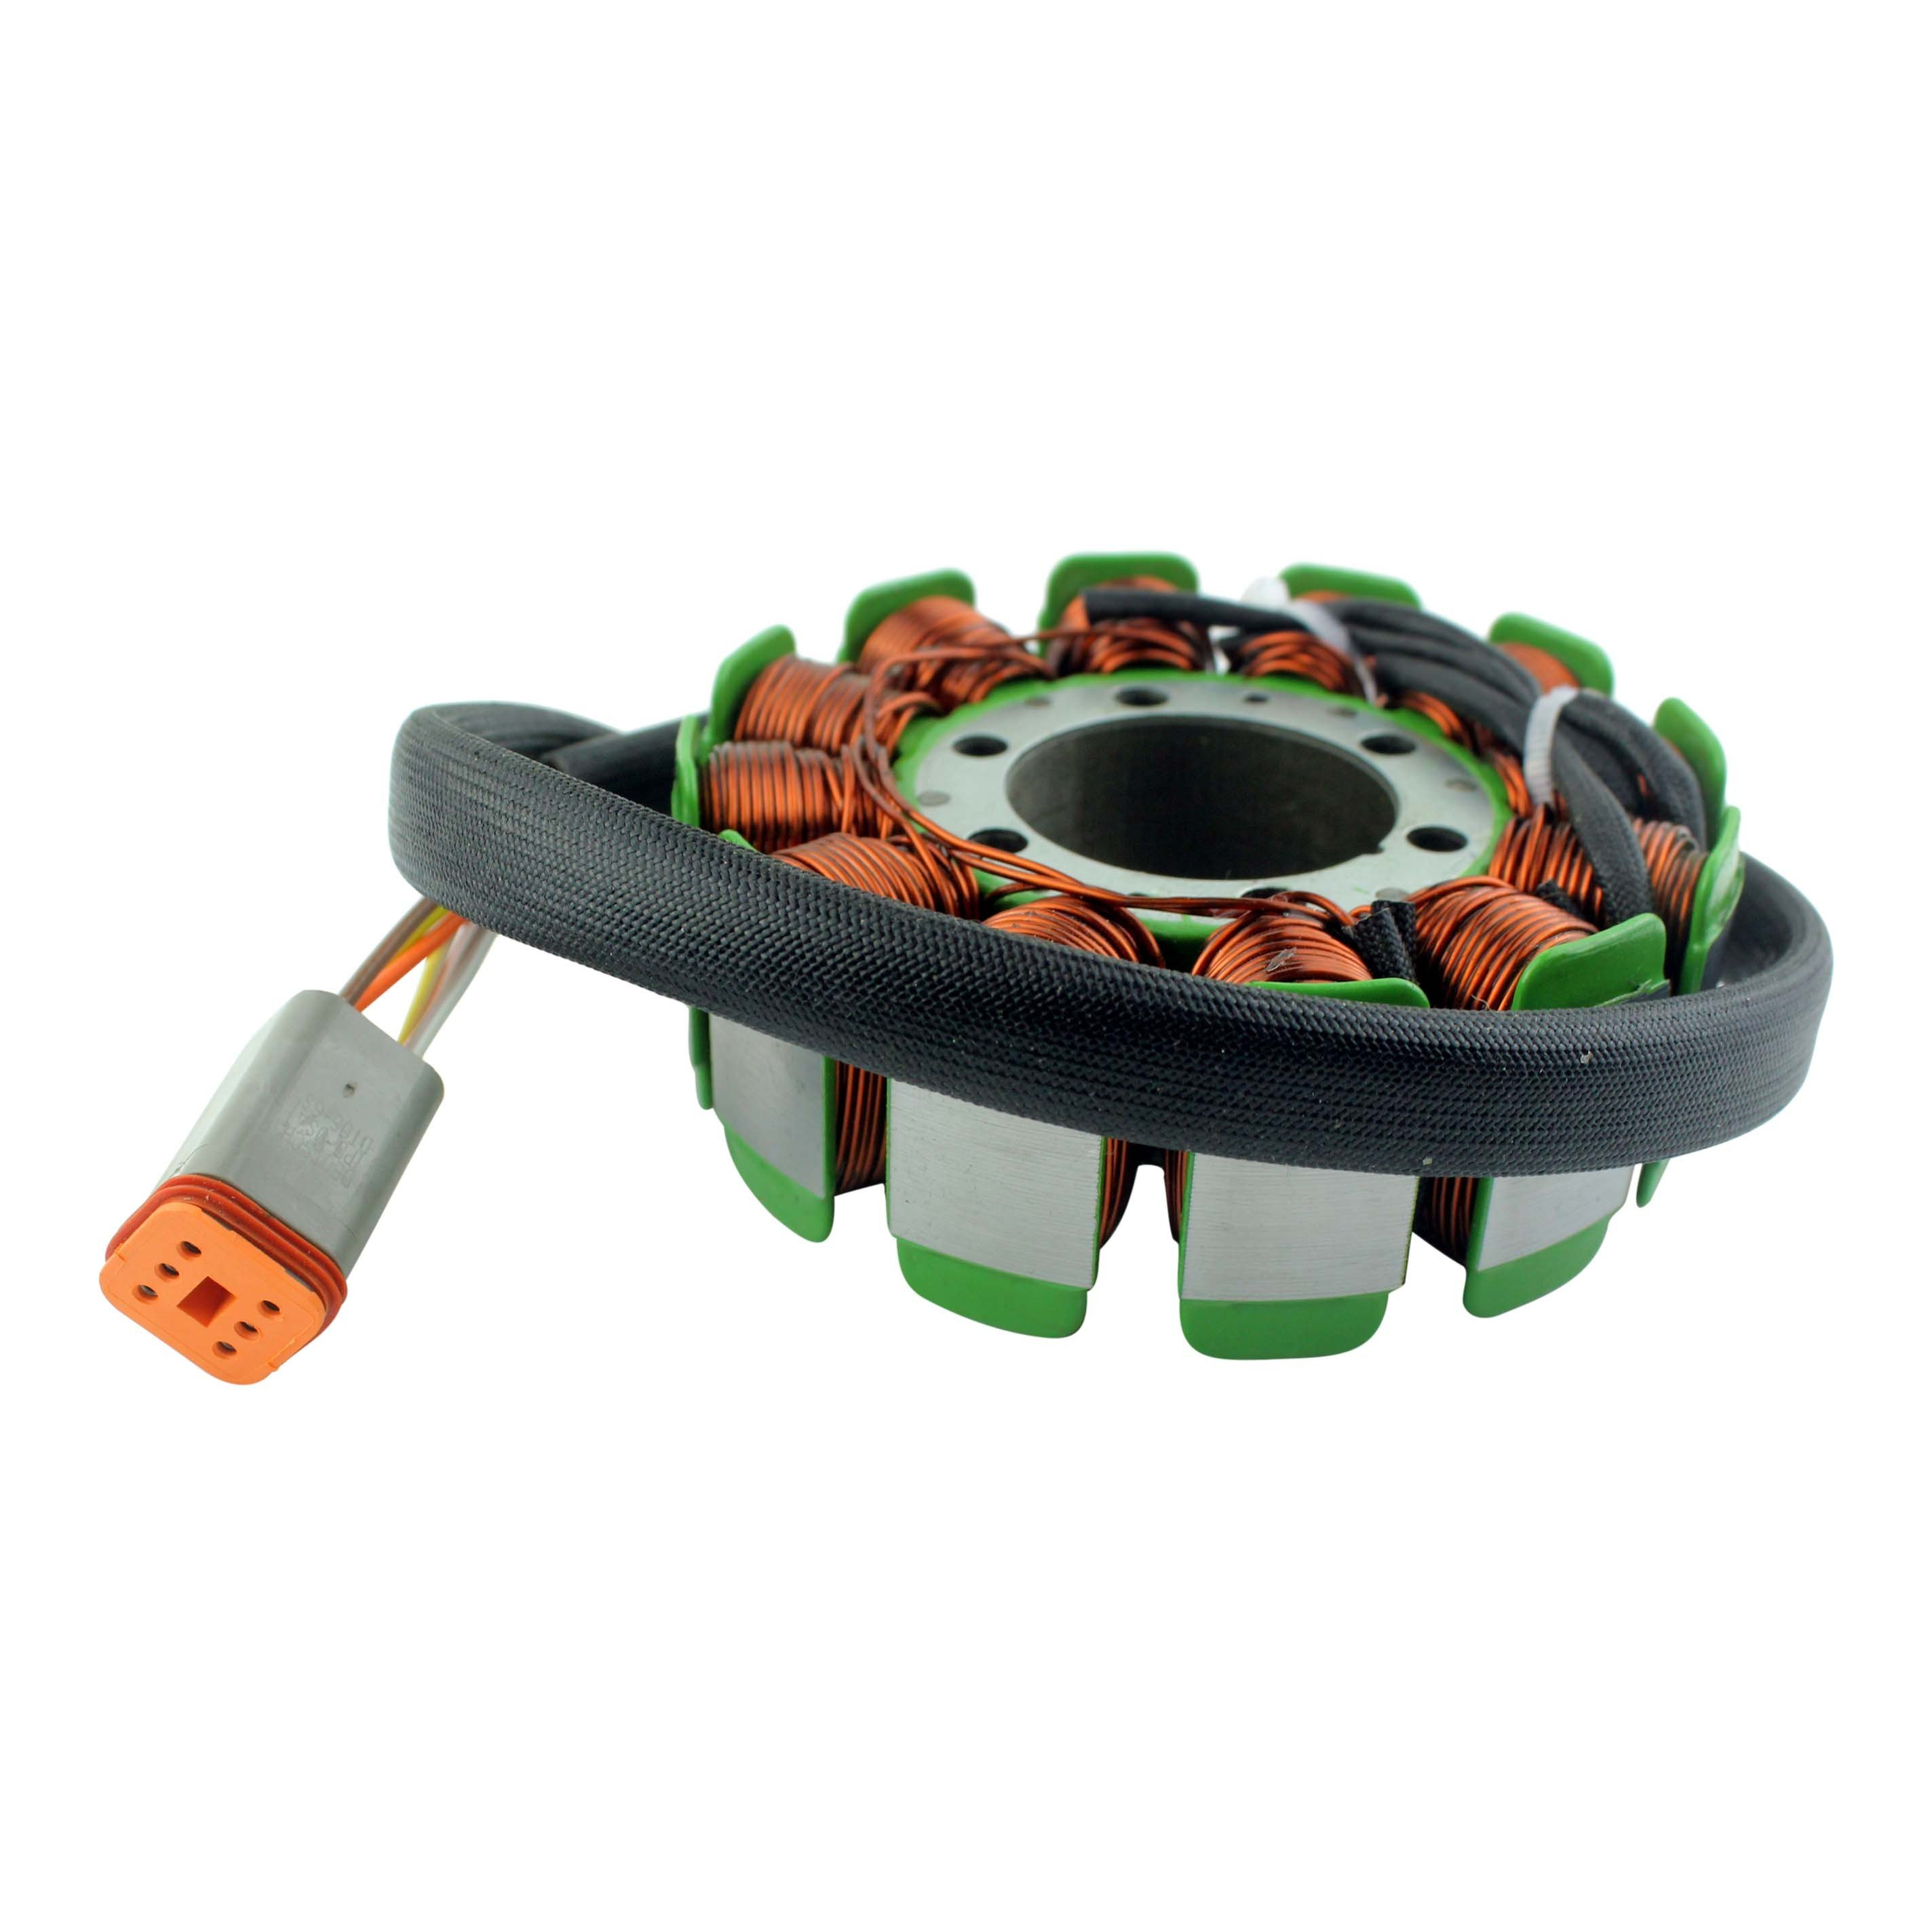 Ski-Doo 600 HO E-Tec 800 E-Tec | Stator Coil | Moto-Electrical